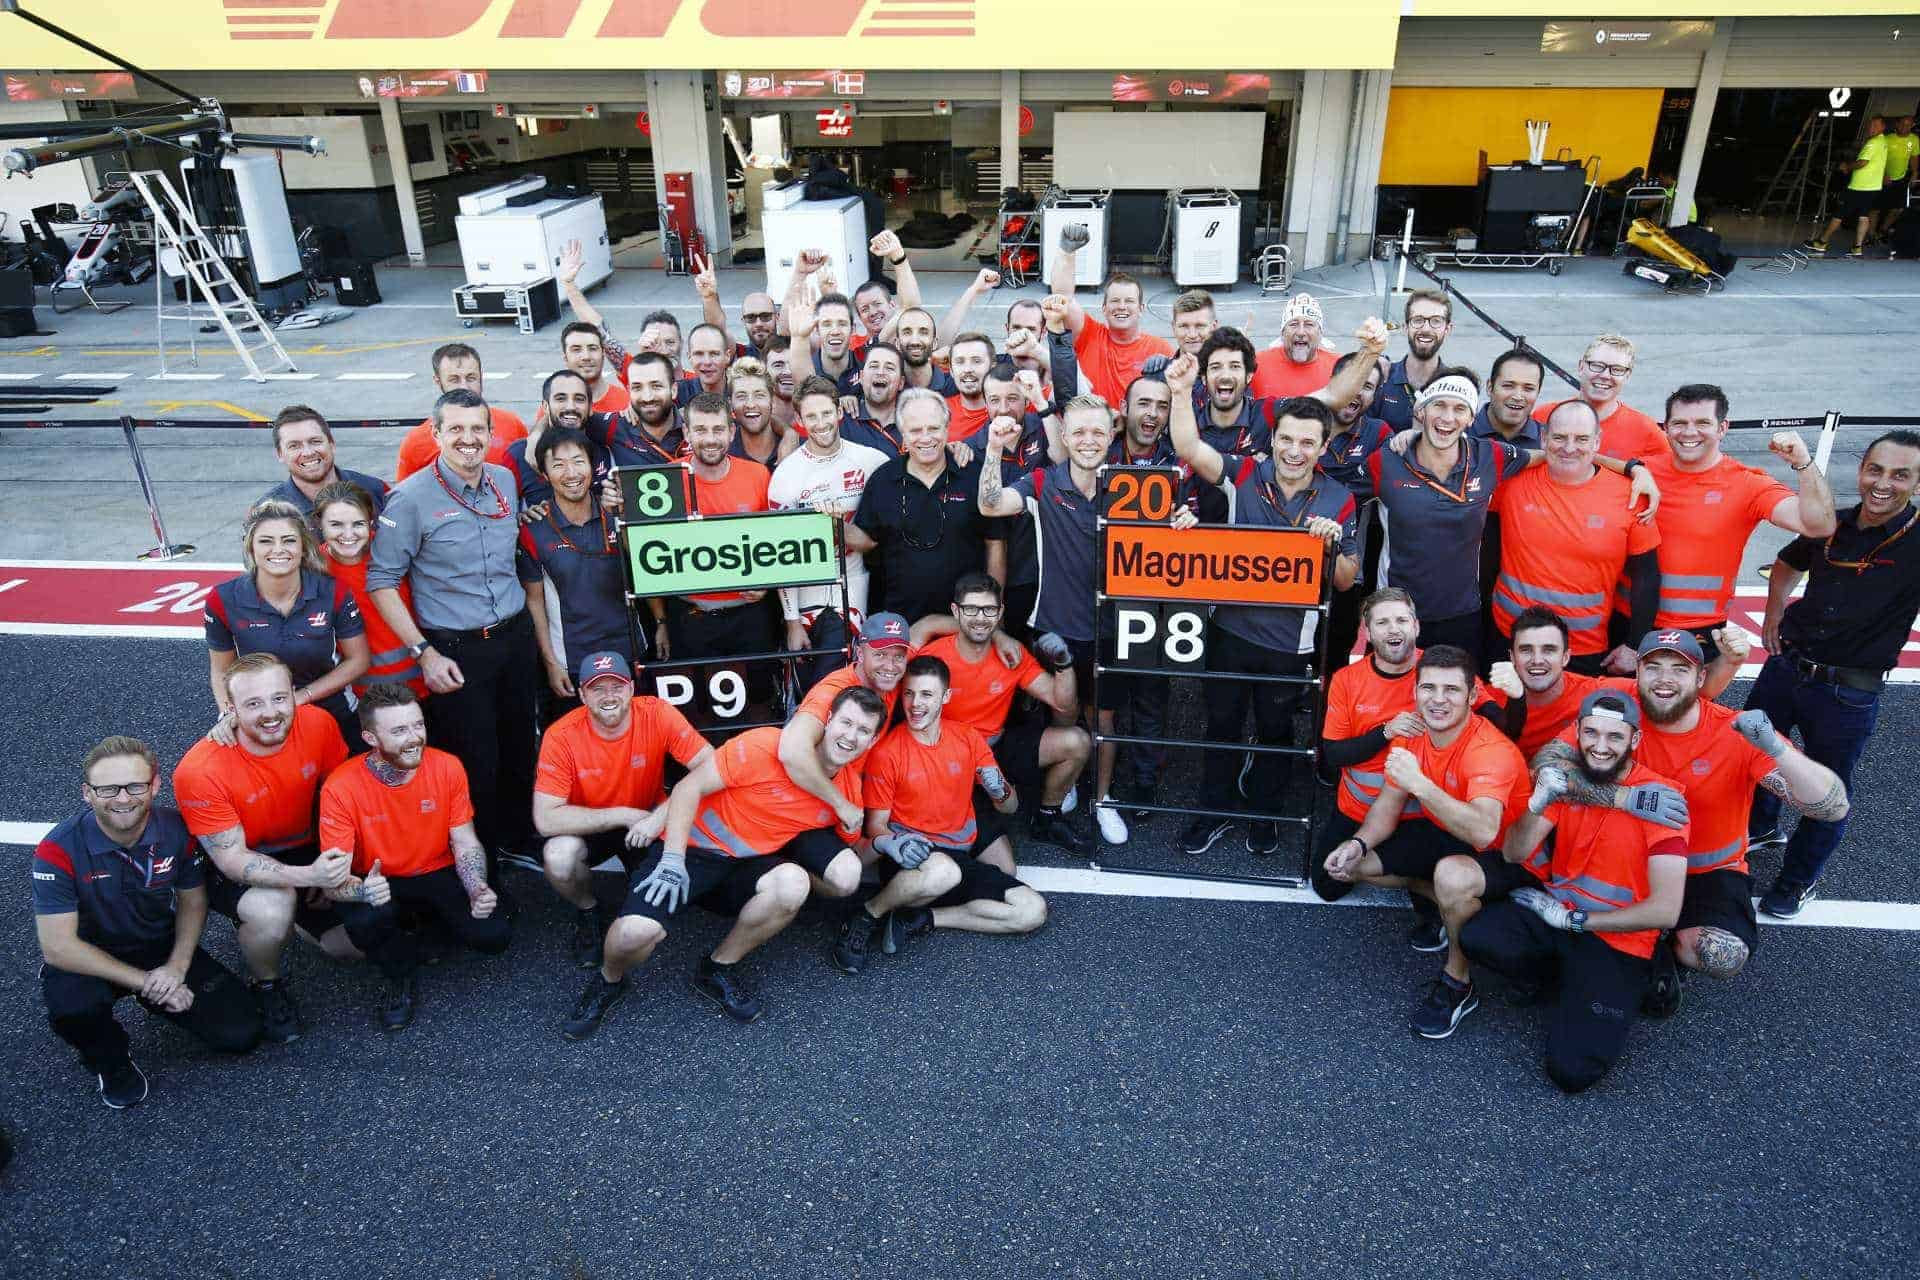 Haas Japanese gP F1 2017 Suzuka celebration Photo Haas